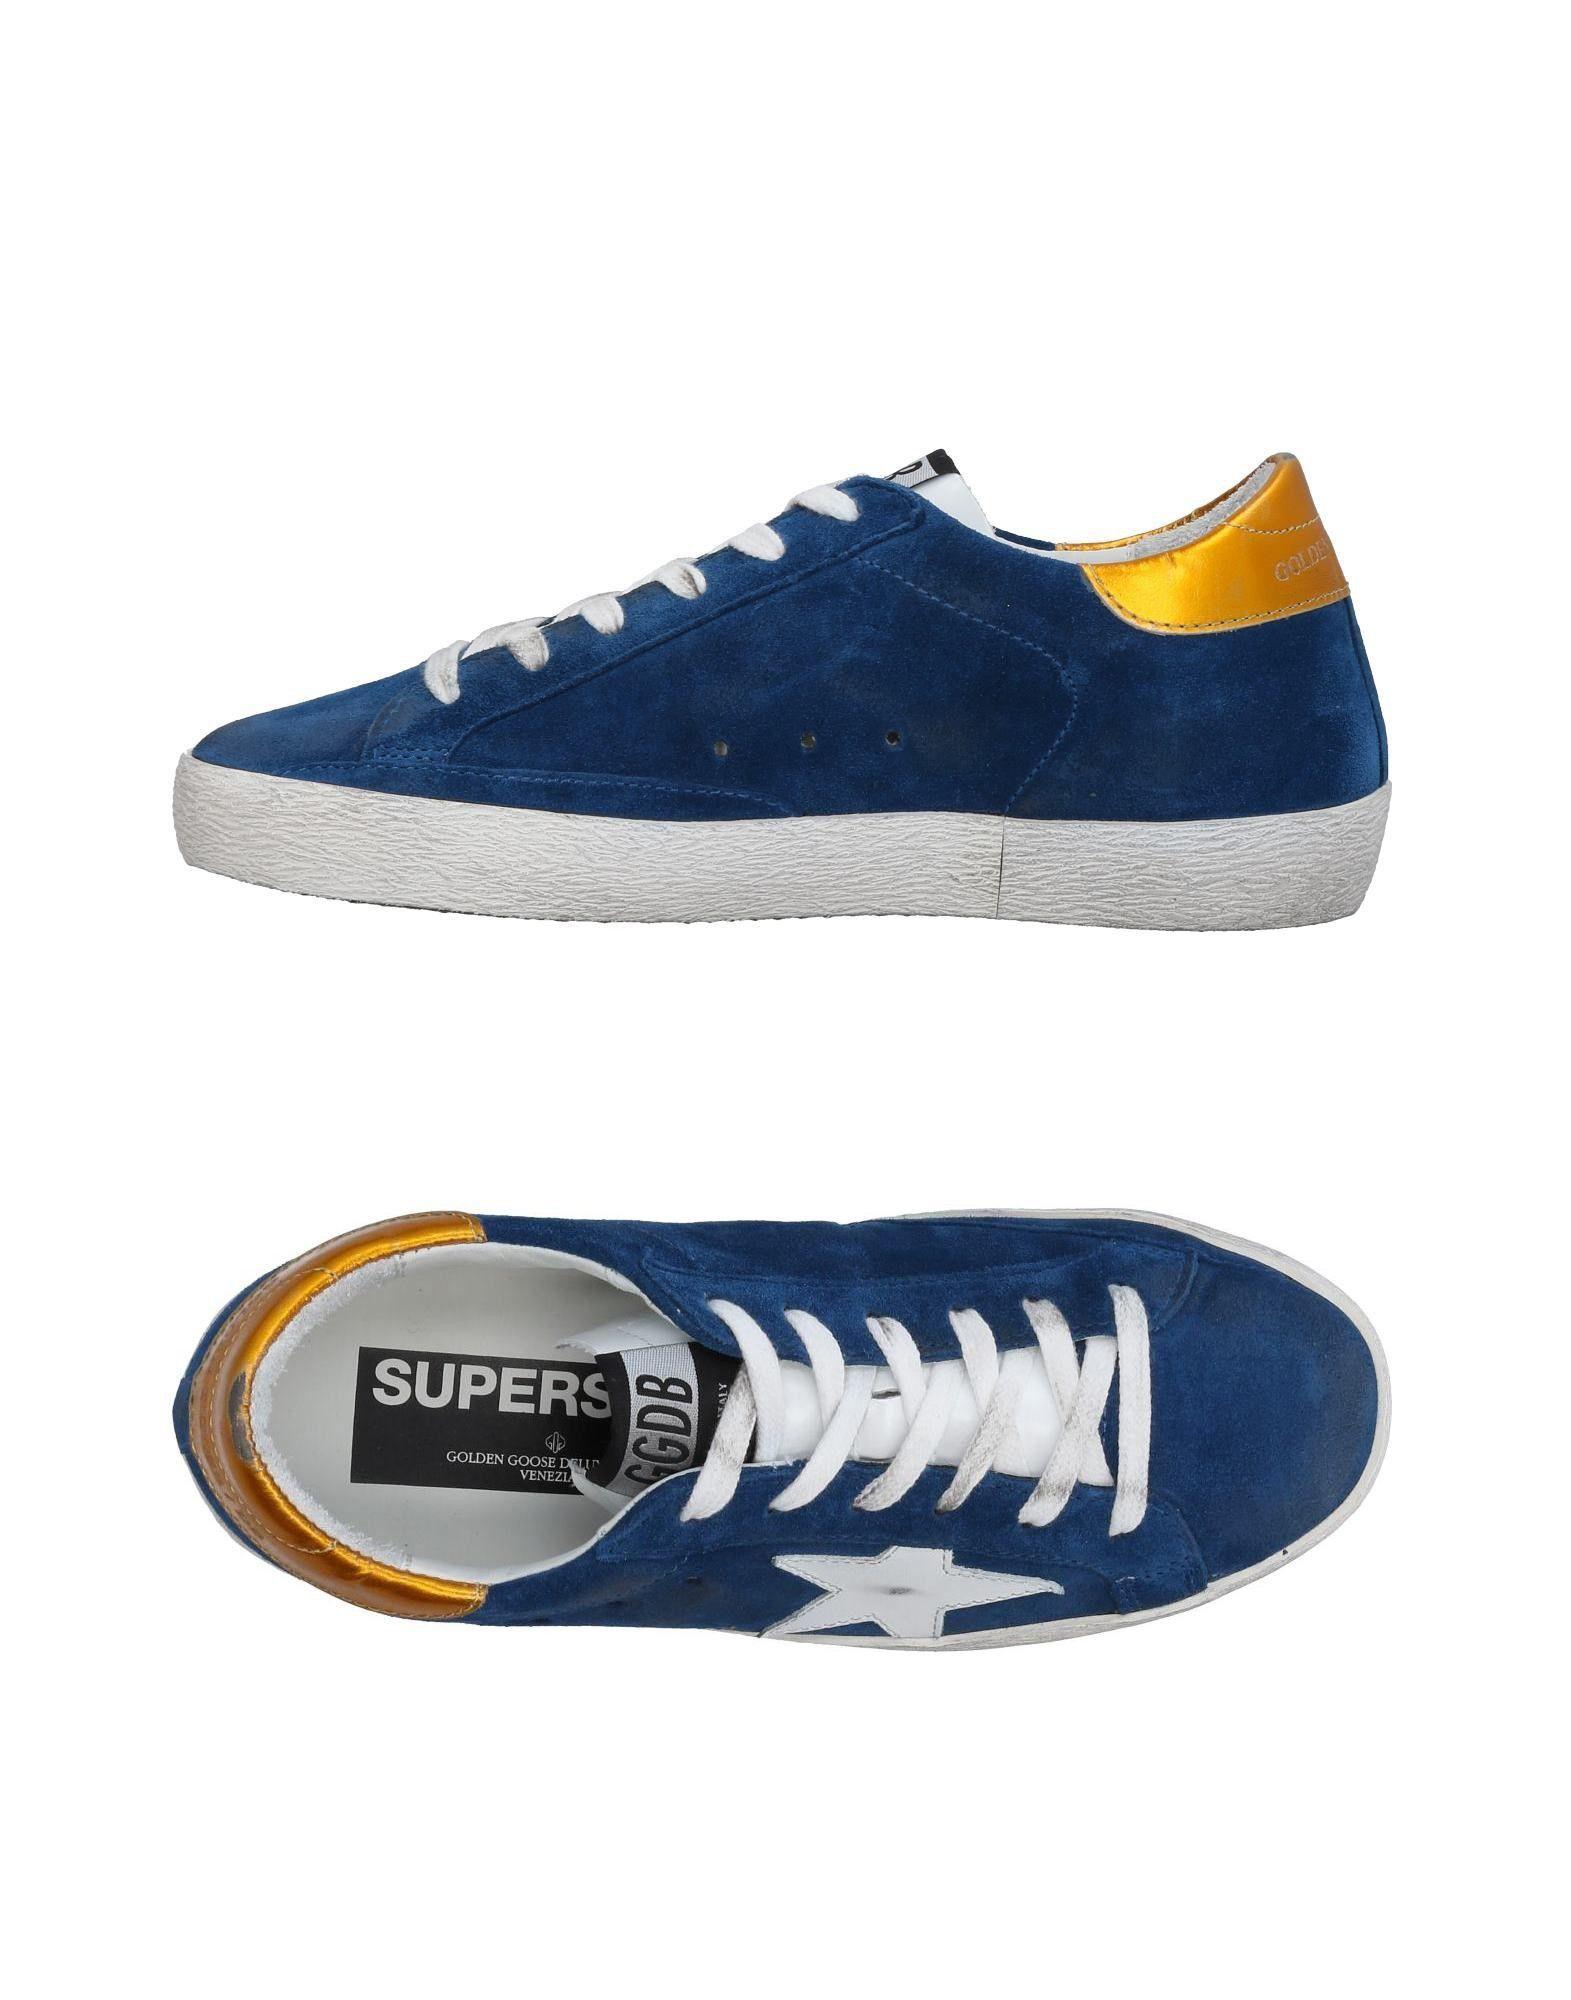 Descuento de la marca Zapatillas Gold Goose Deluxe Brand Mujer Goose - Zapatillas Gold Goose Mujer Deluxe Brand  Azul marino e9fcea